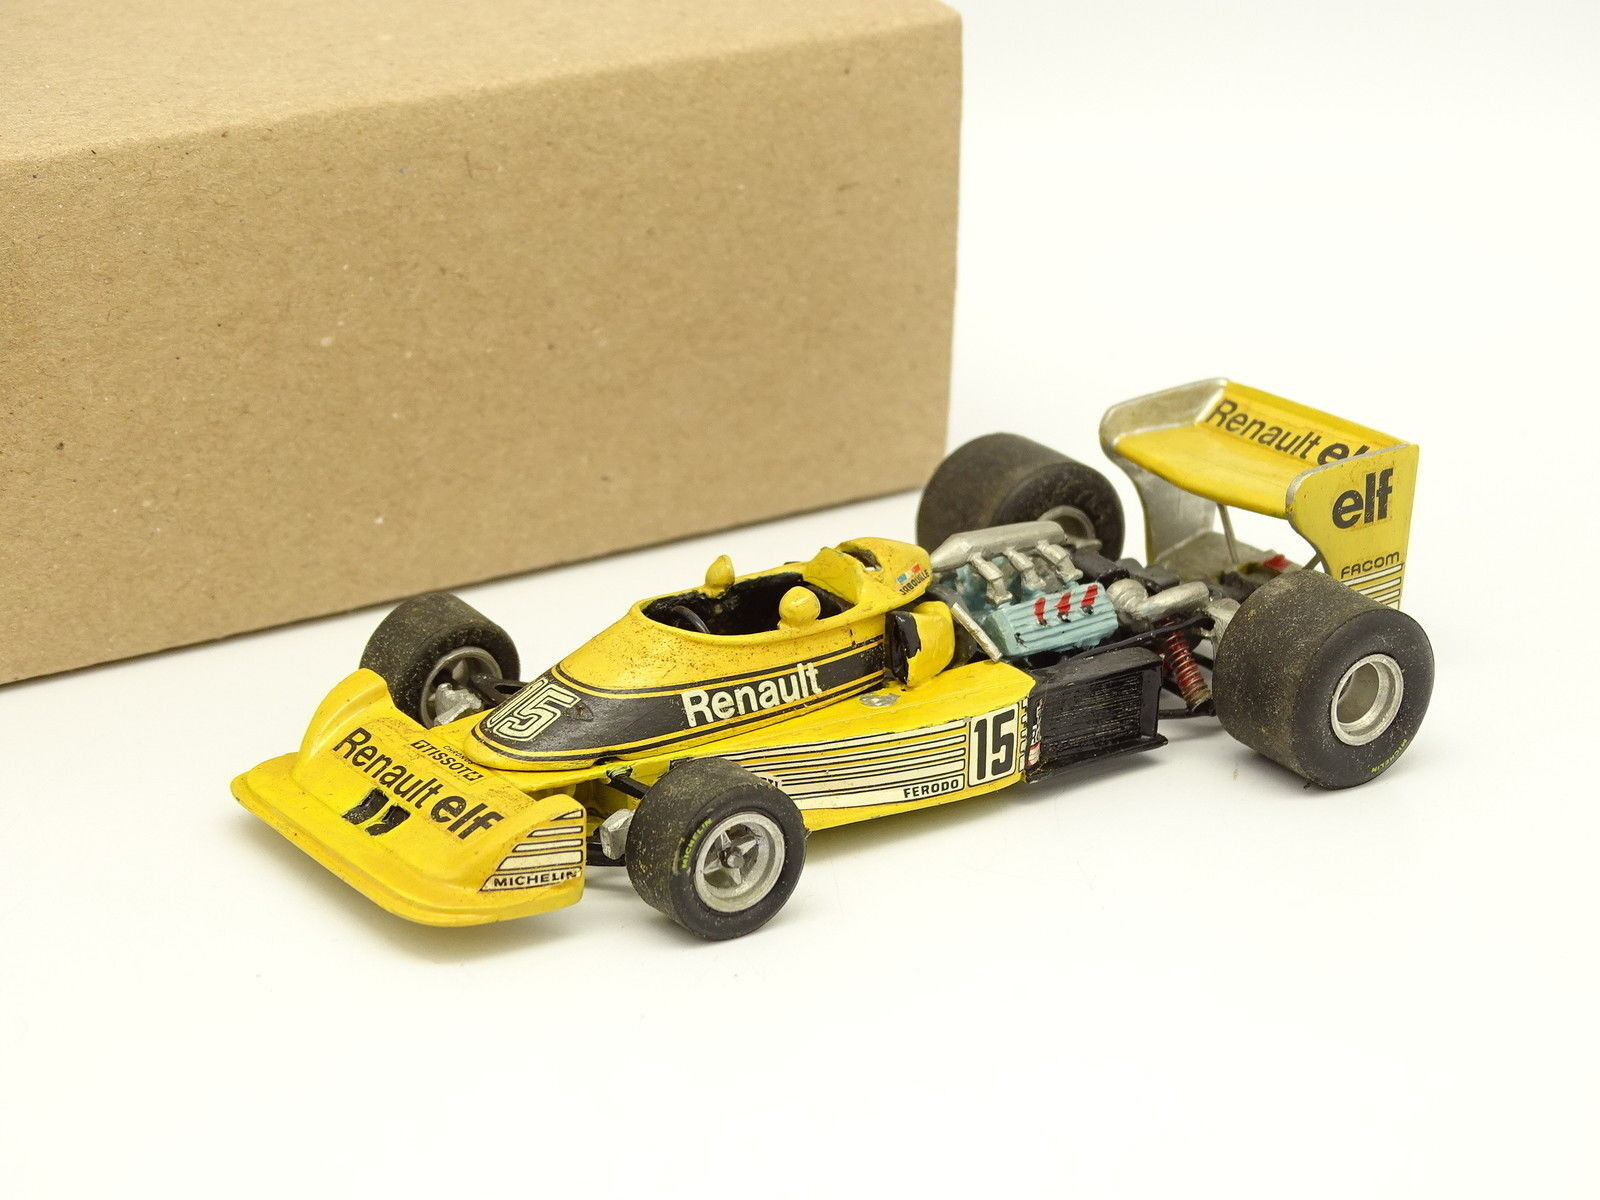 Tenariv Kit Metal Montado 1 43 - F1 Renault RS01 1 Dutch GP 1977 Jabouille